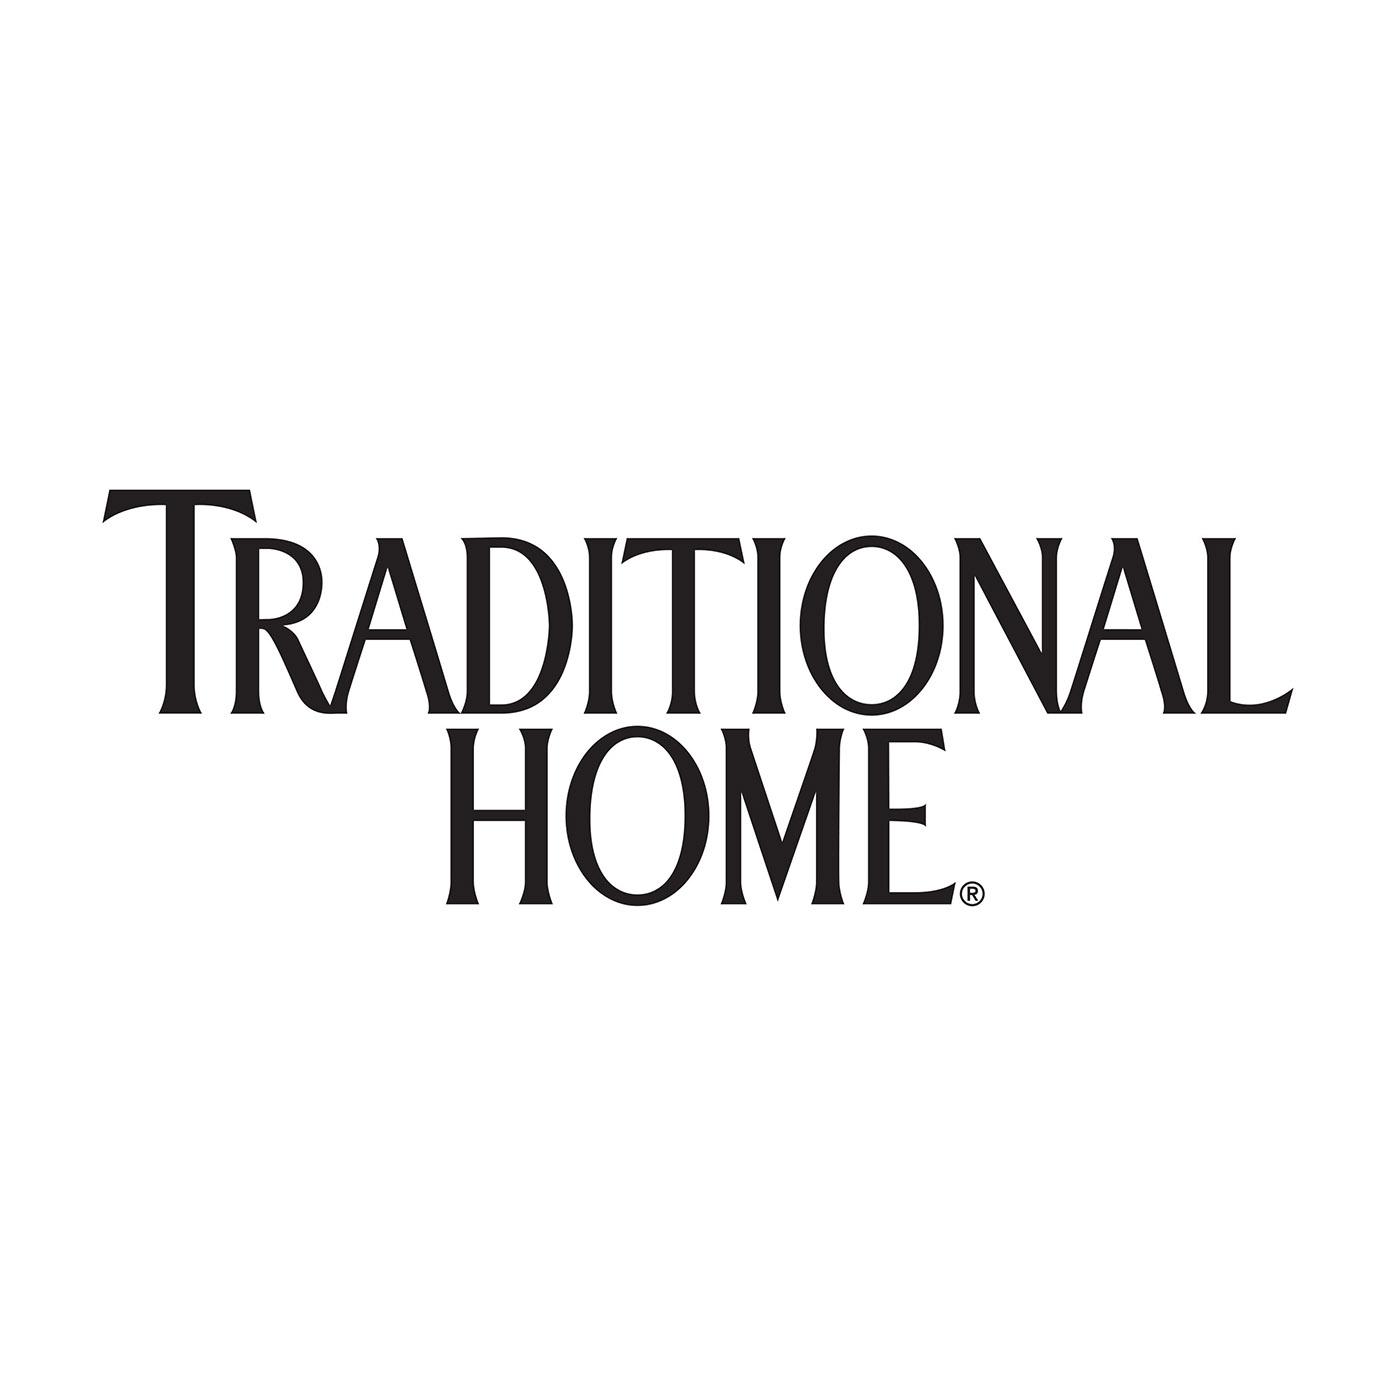 Traditional-Home-logo-2.jpg